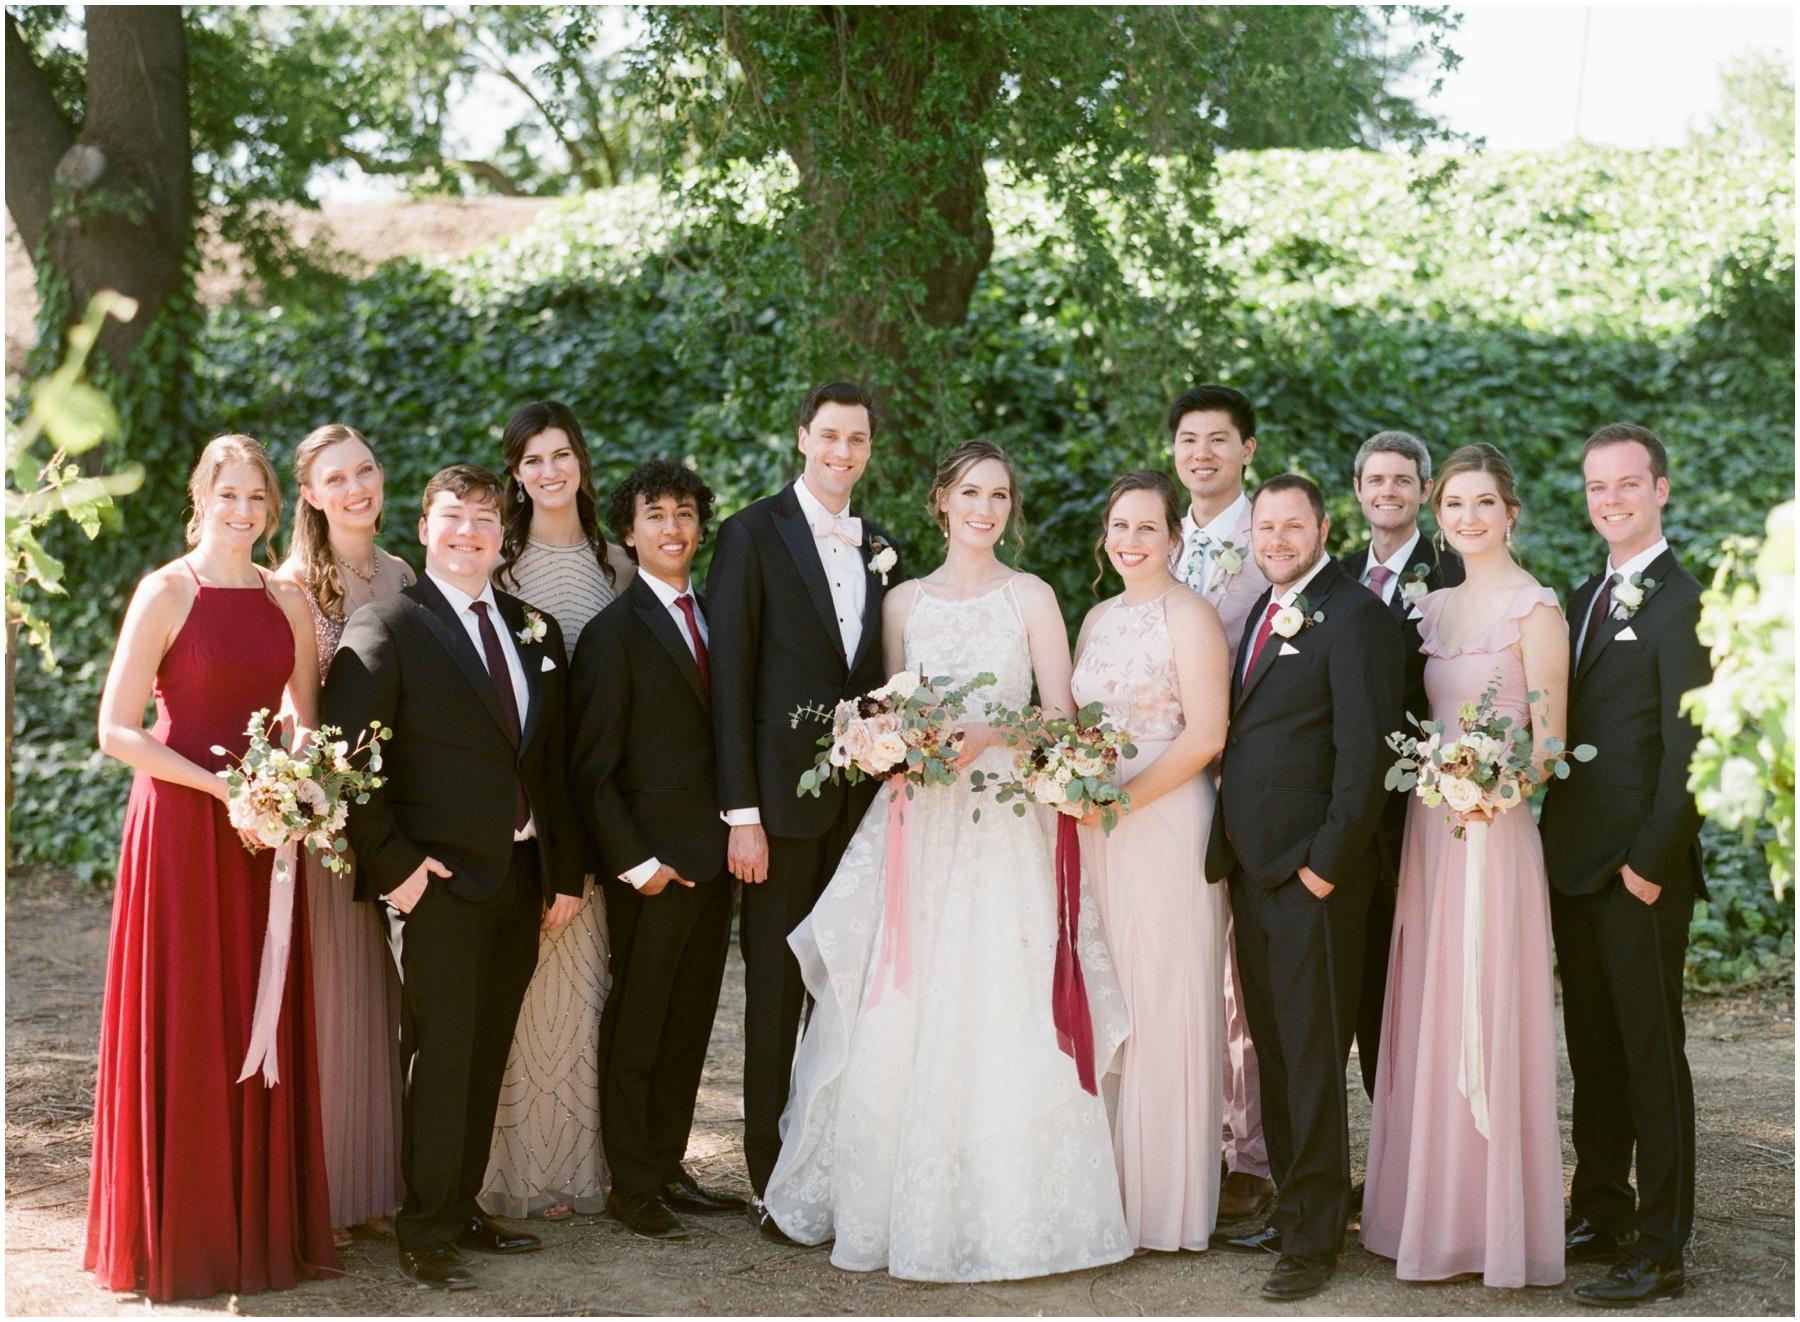 Scribner-bend-vineyards-wedding-sacramento-california-Kristine-Herman-Photography-226.jpg